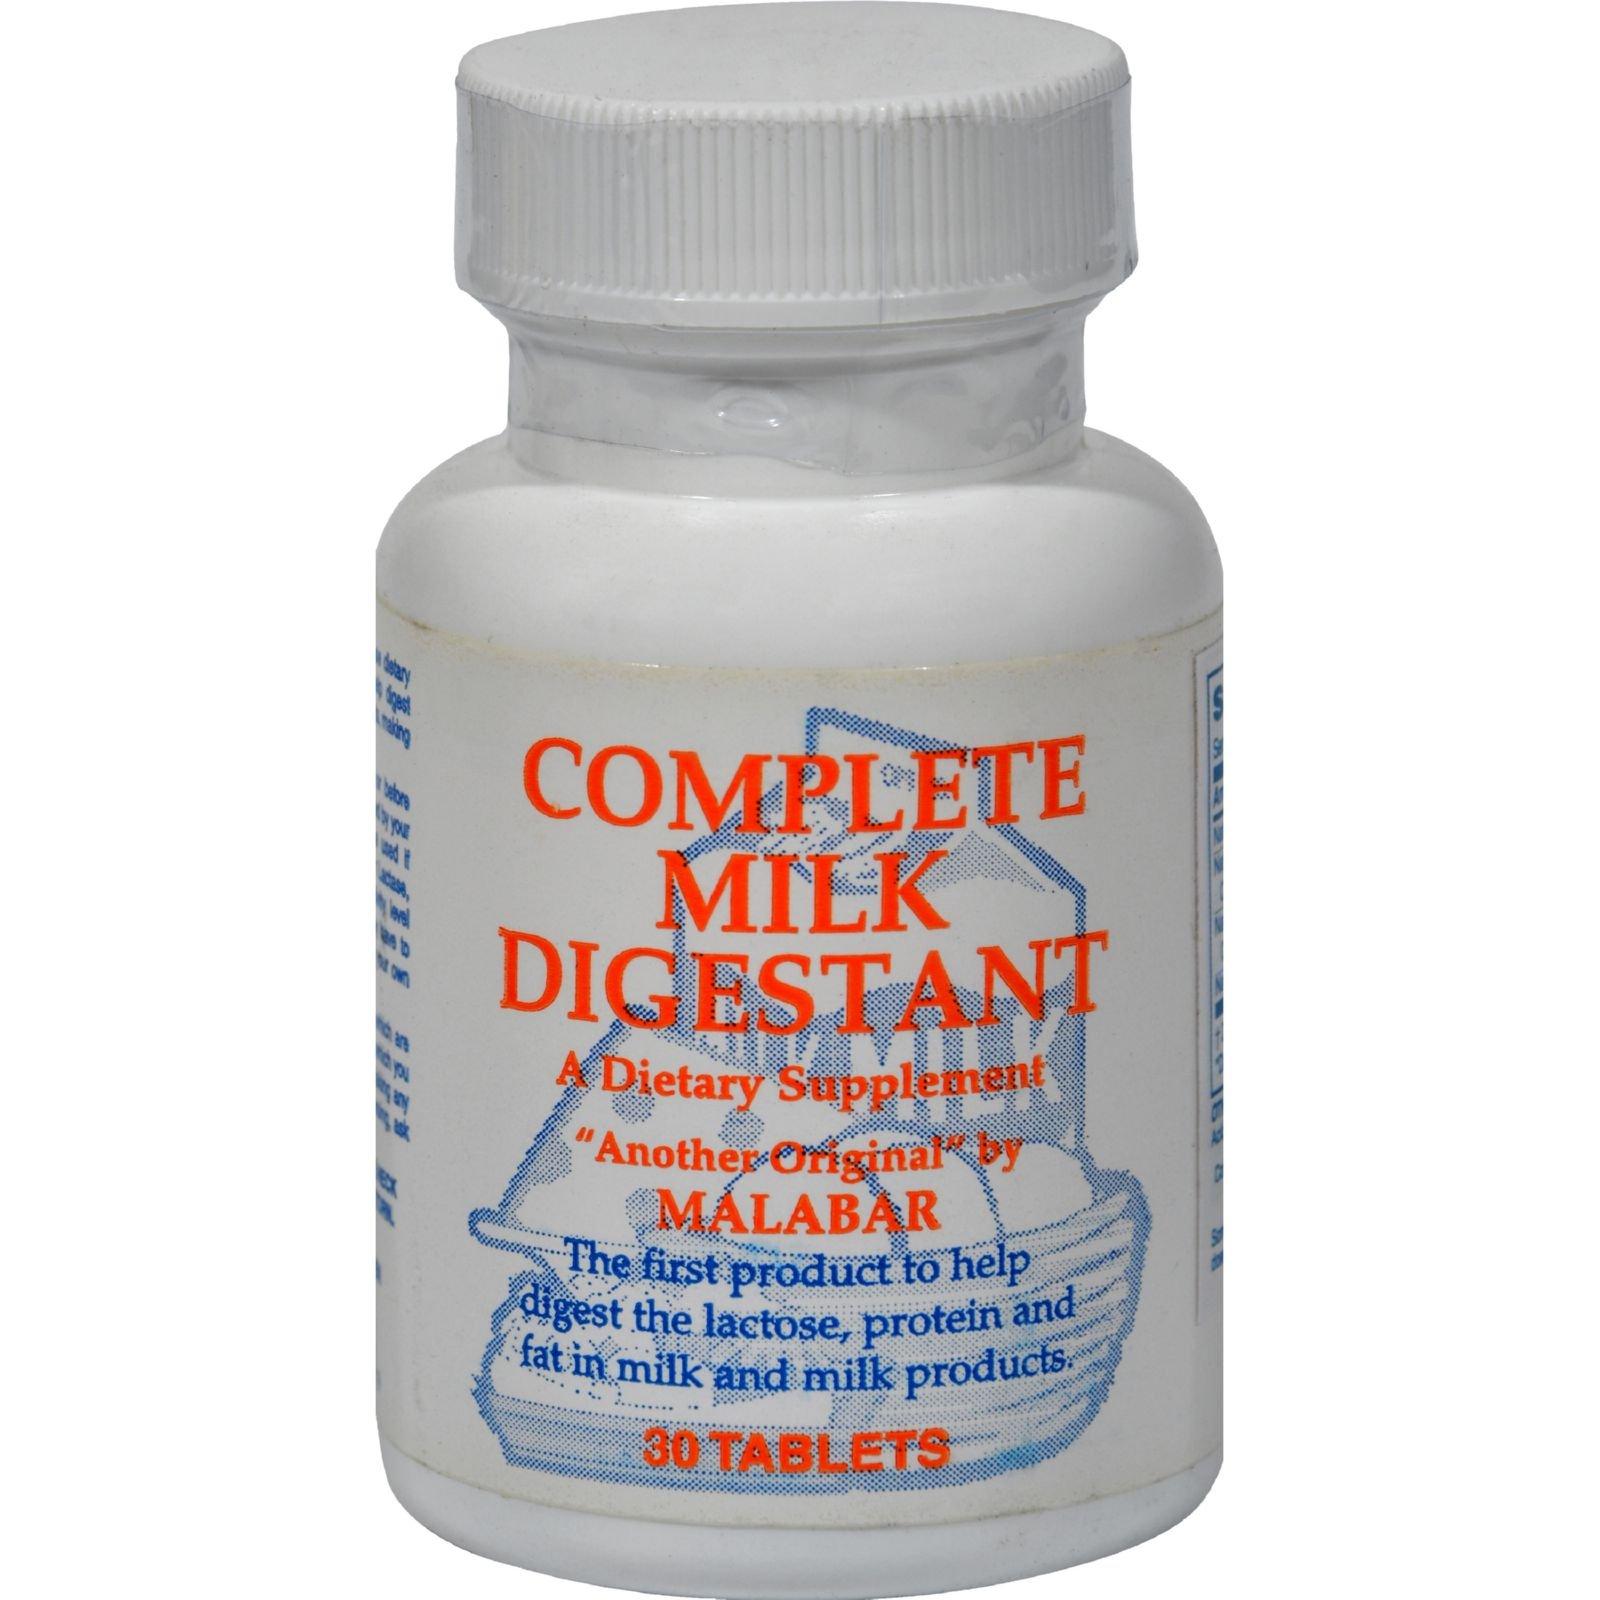 Malabar Complete Milk Digestant - 30 Tablets (Pack of 2)